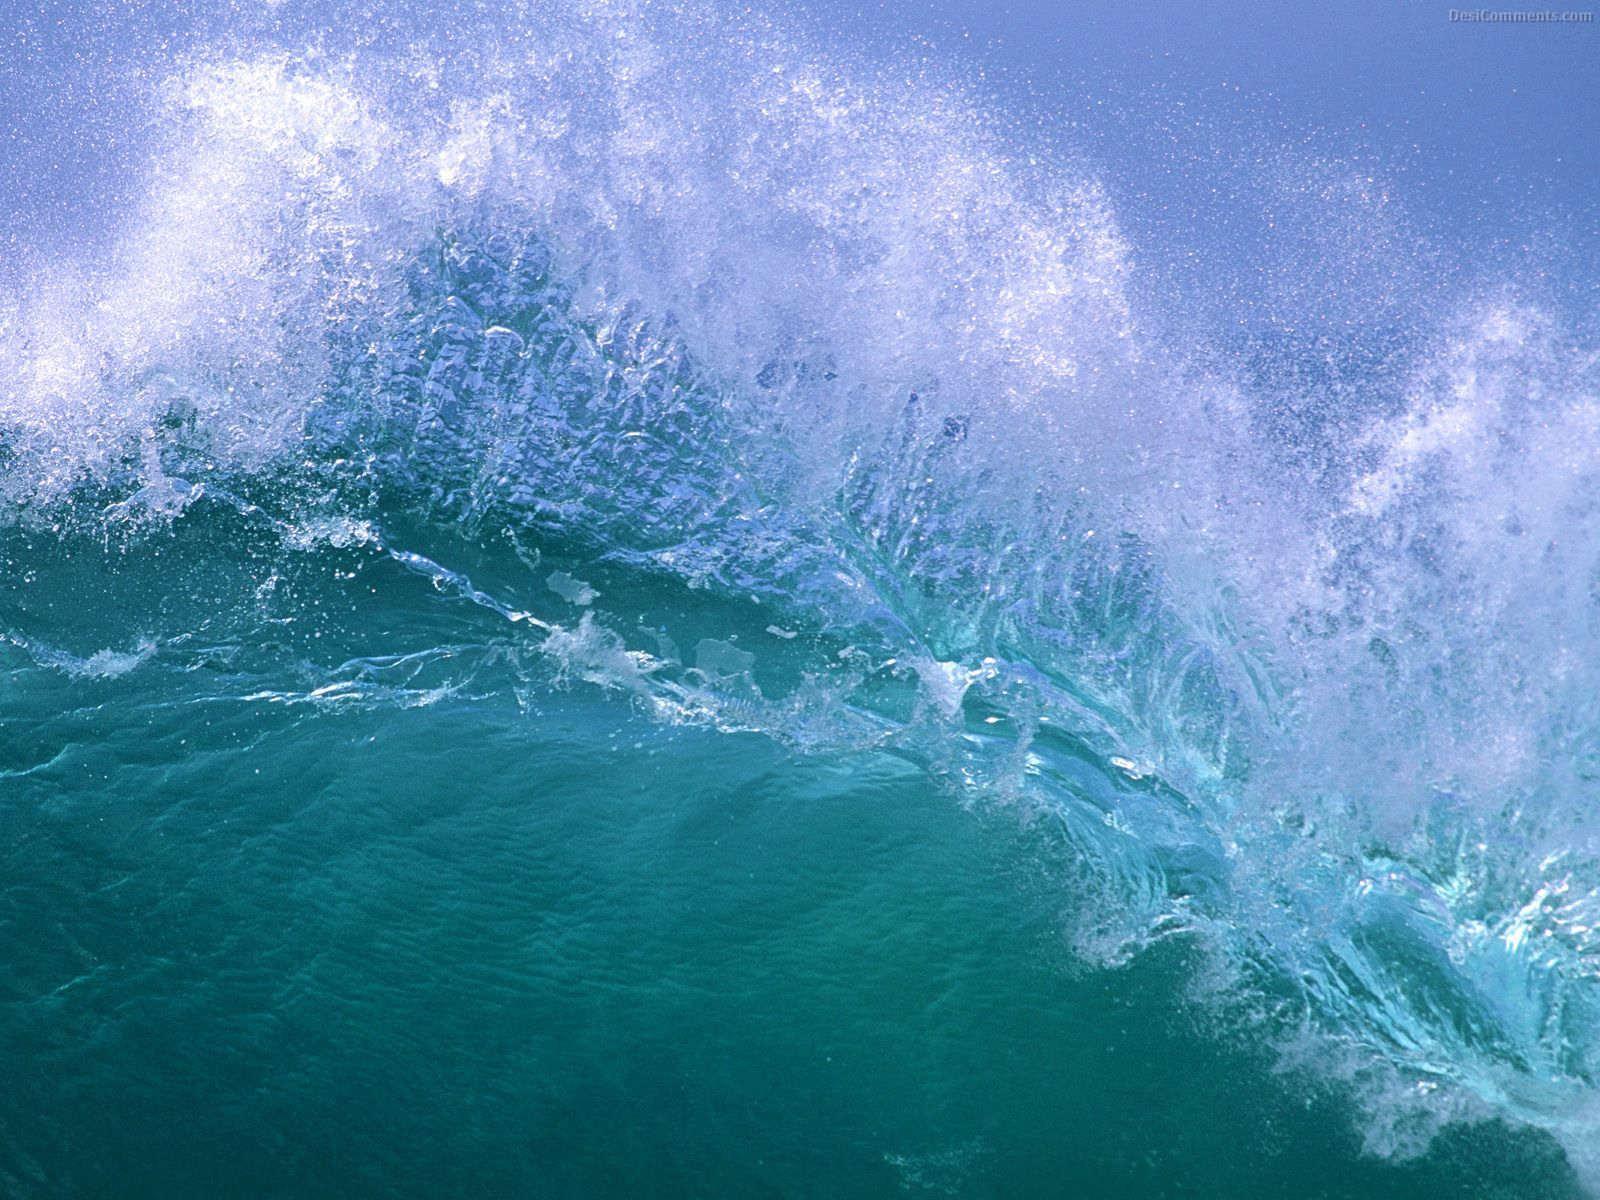 Ocean Wallpaper 33 1600x1200